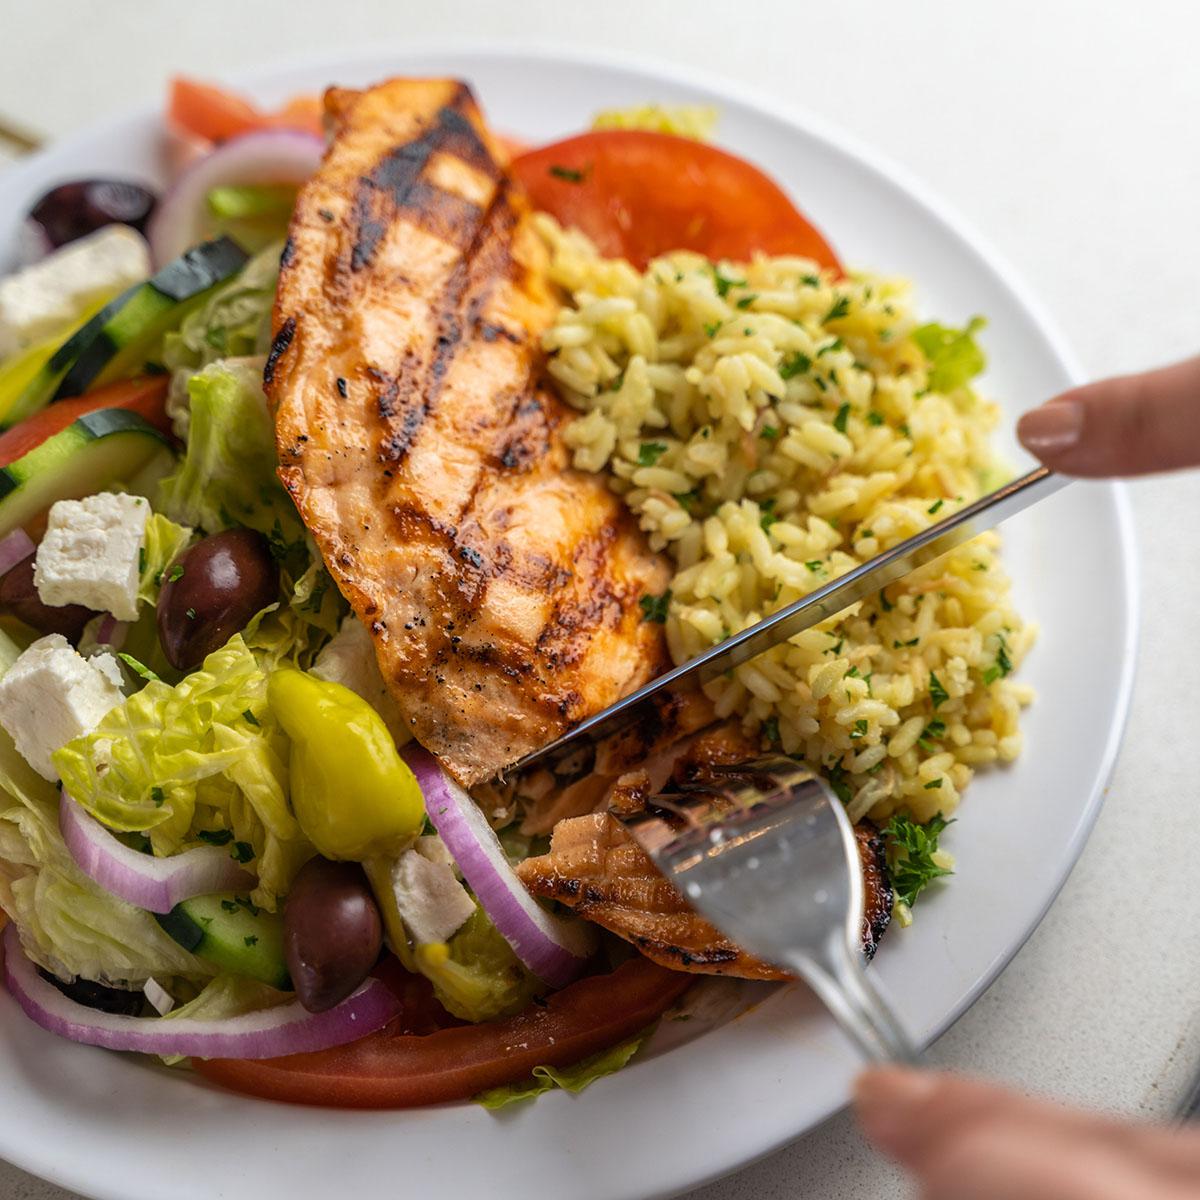 keto diet friendly grilled salmon